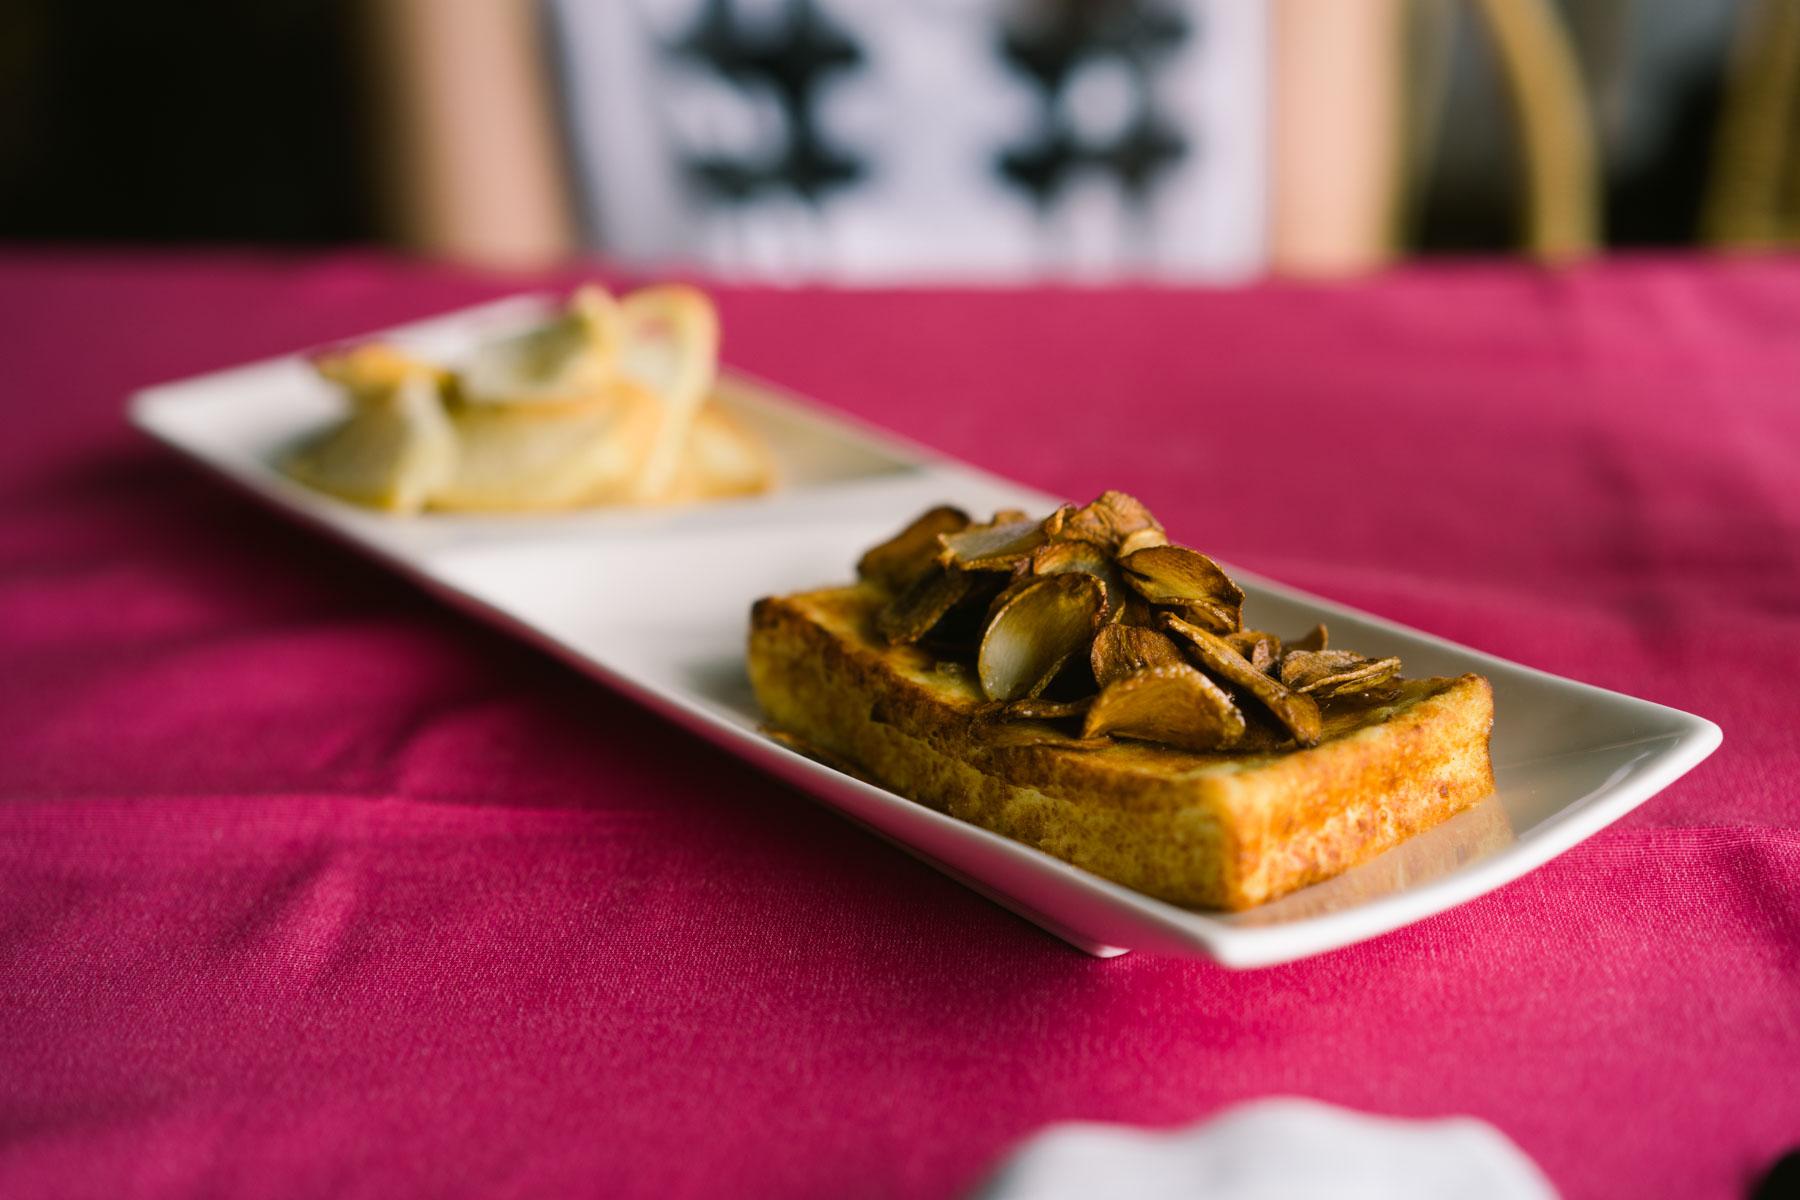 northeast-brazilian-cuisine-what-to-eat-recife-olinda-brazil-brasil-1